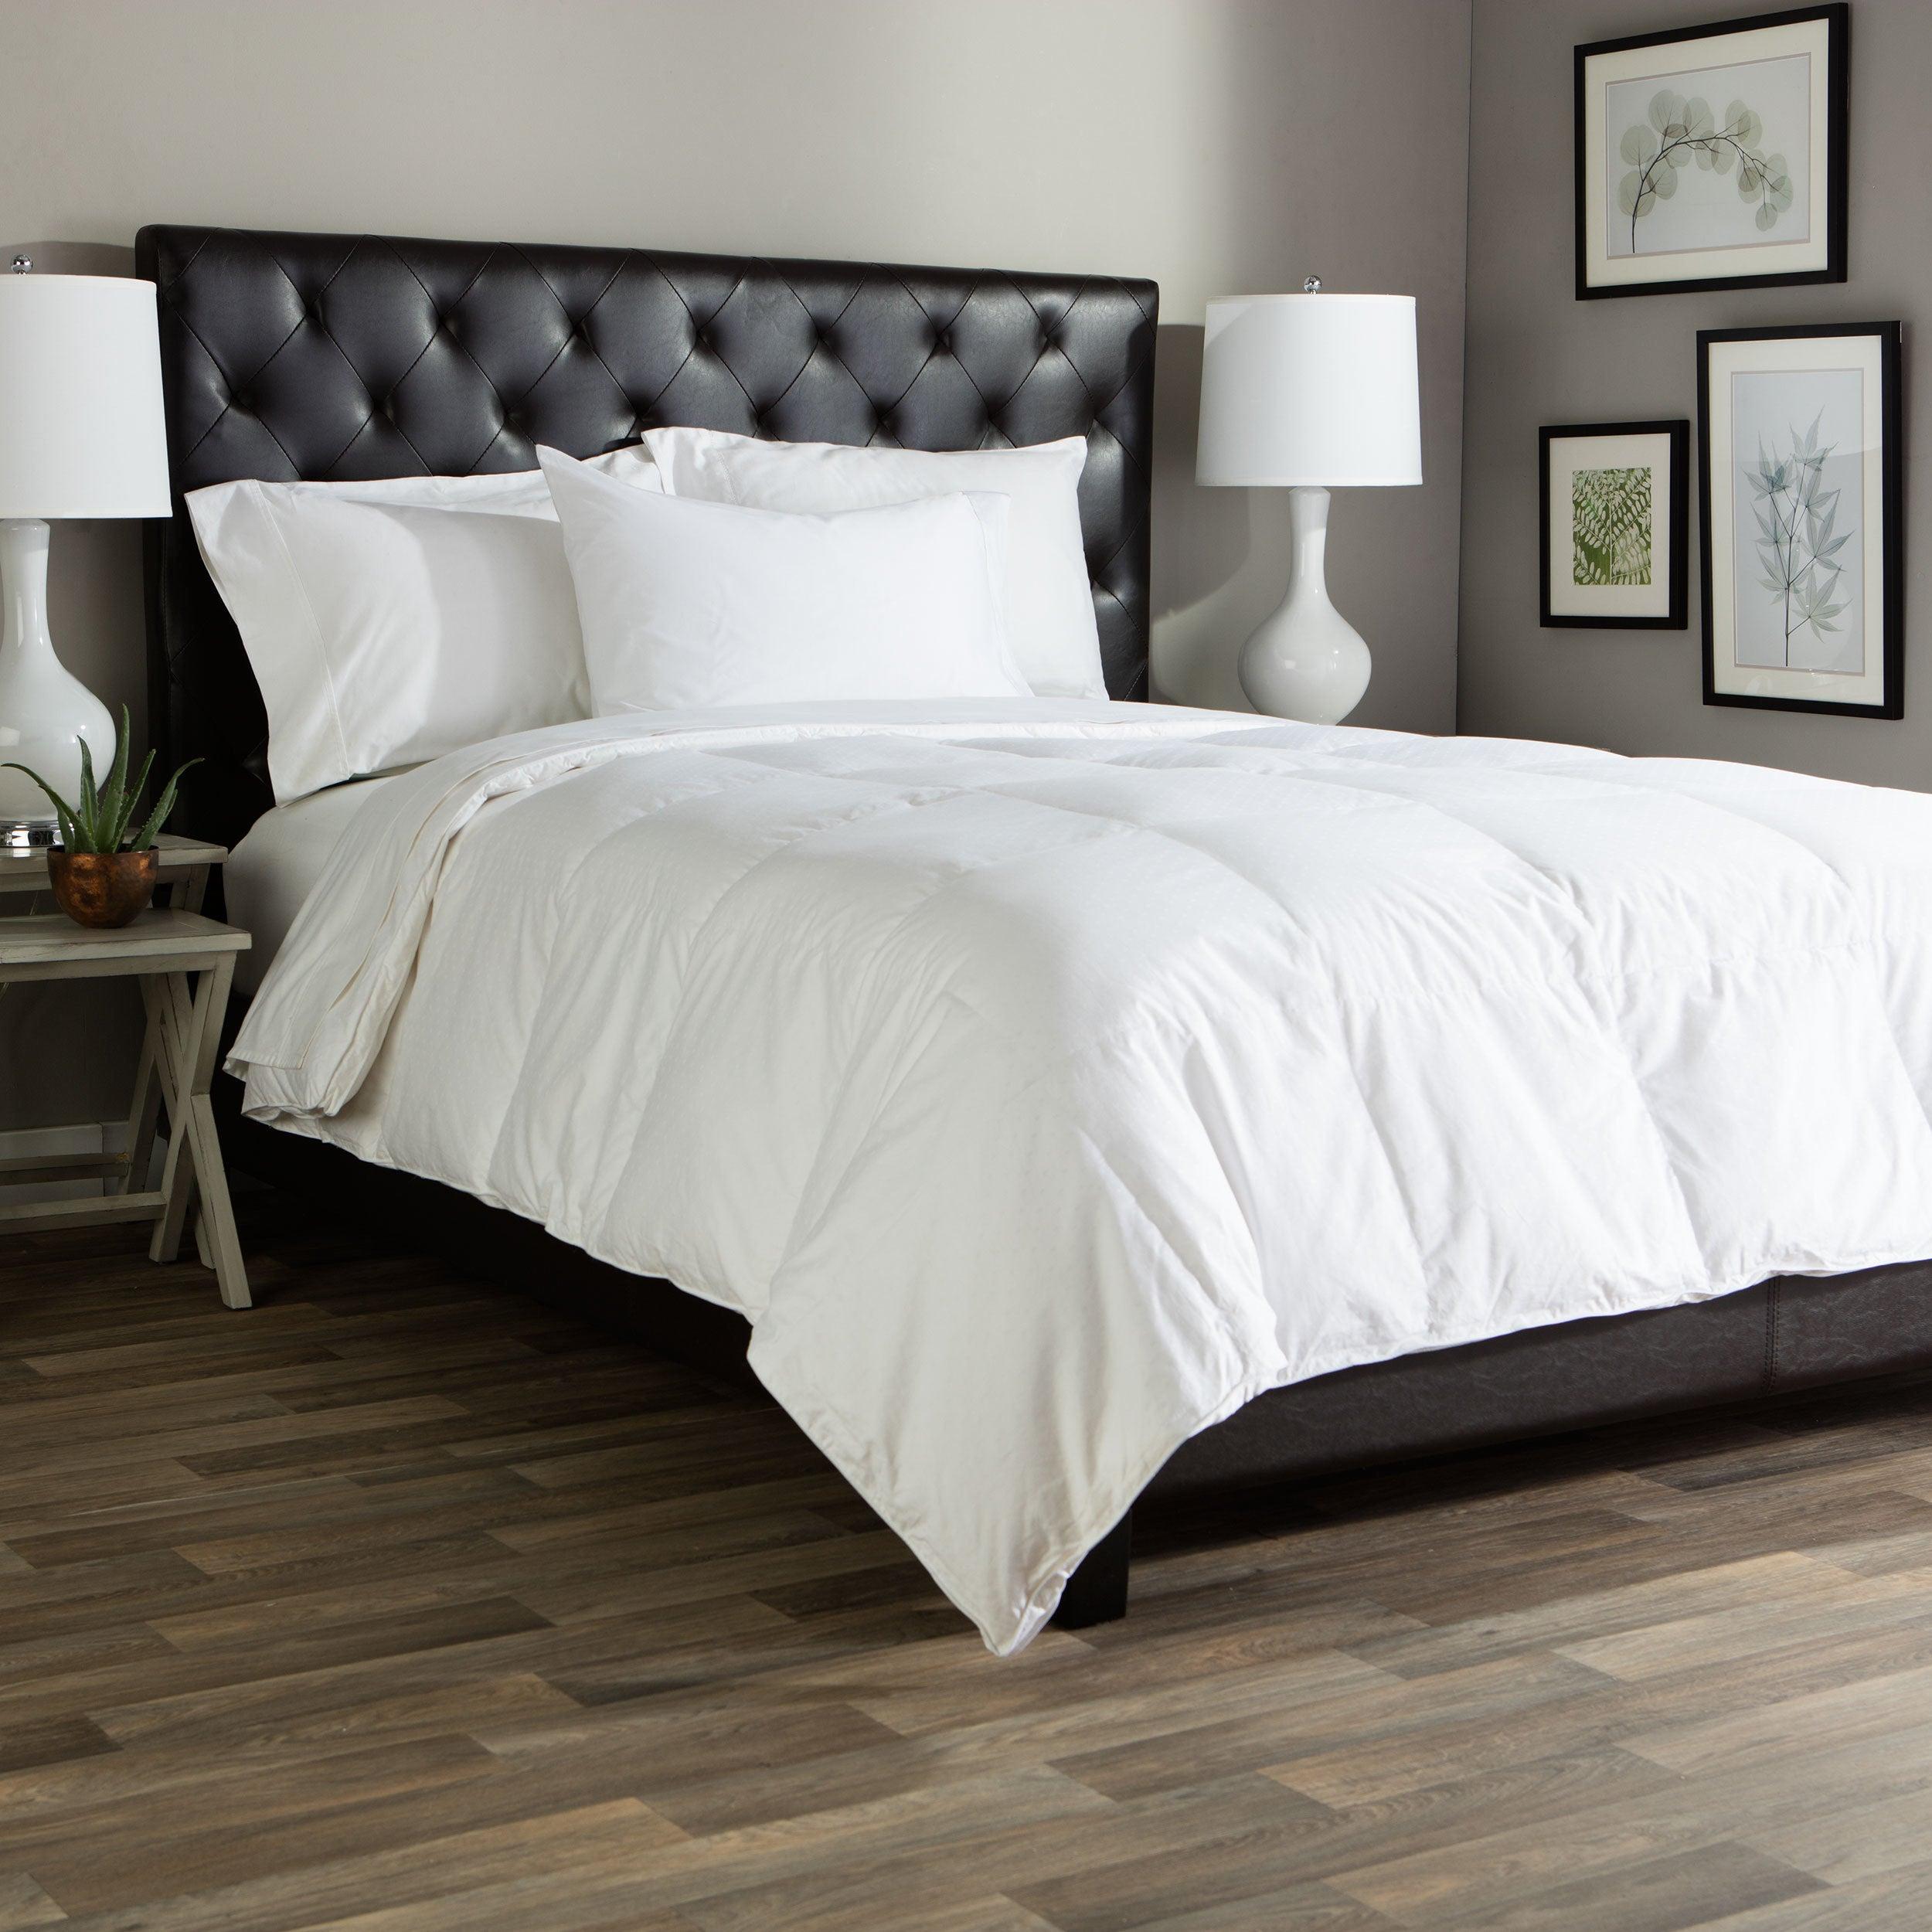 Cozy Classics Superior White Goose Down Comforter Overstock 9032140